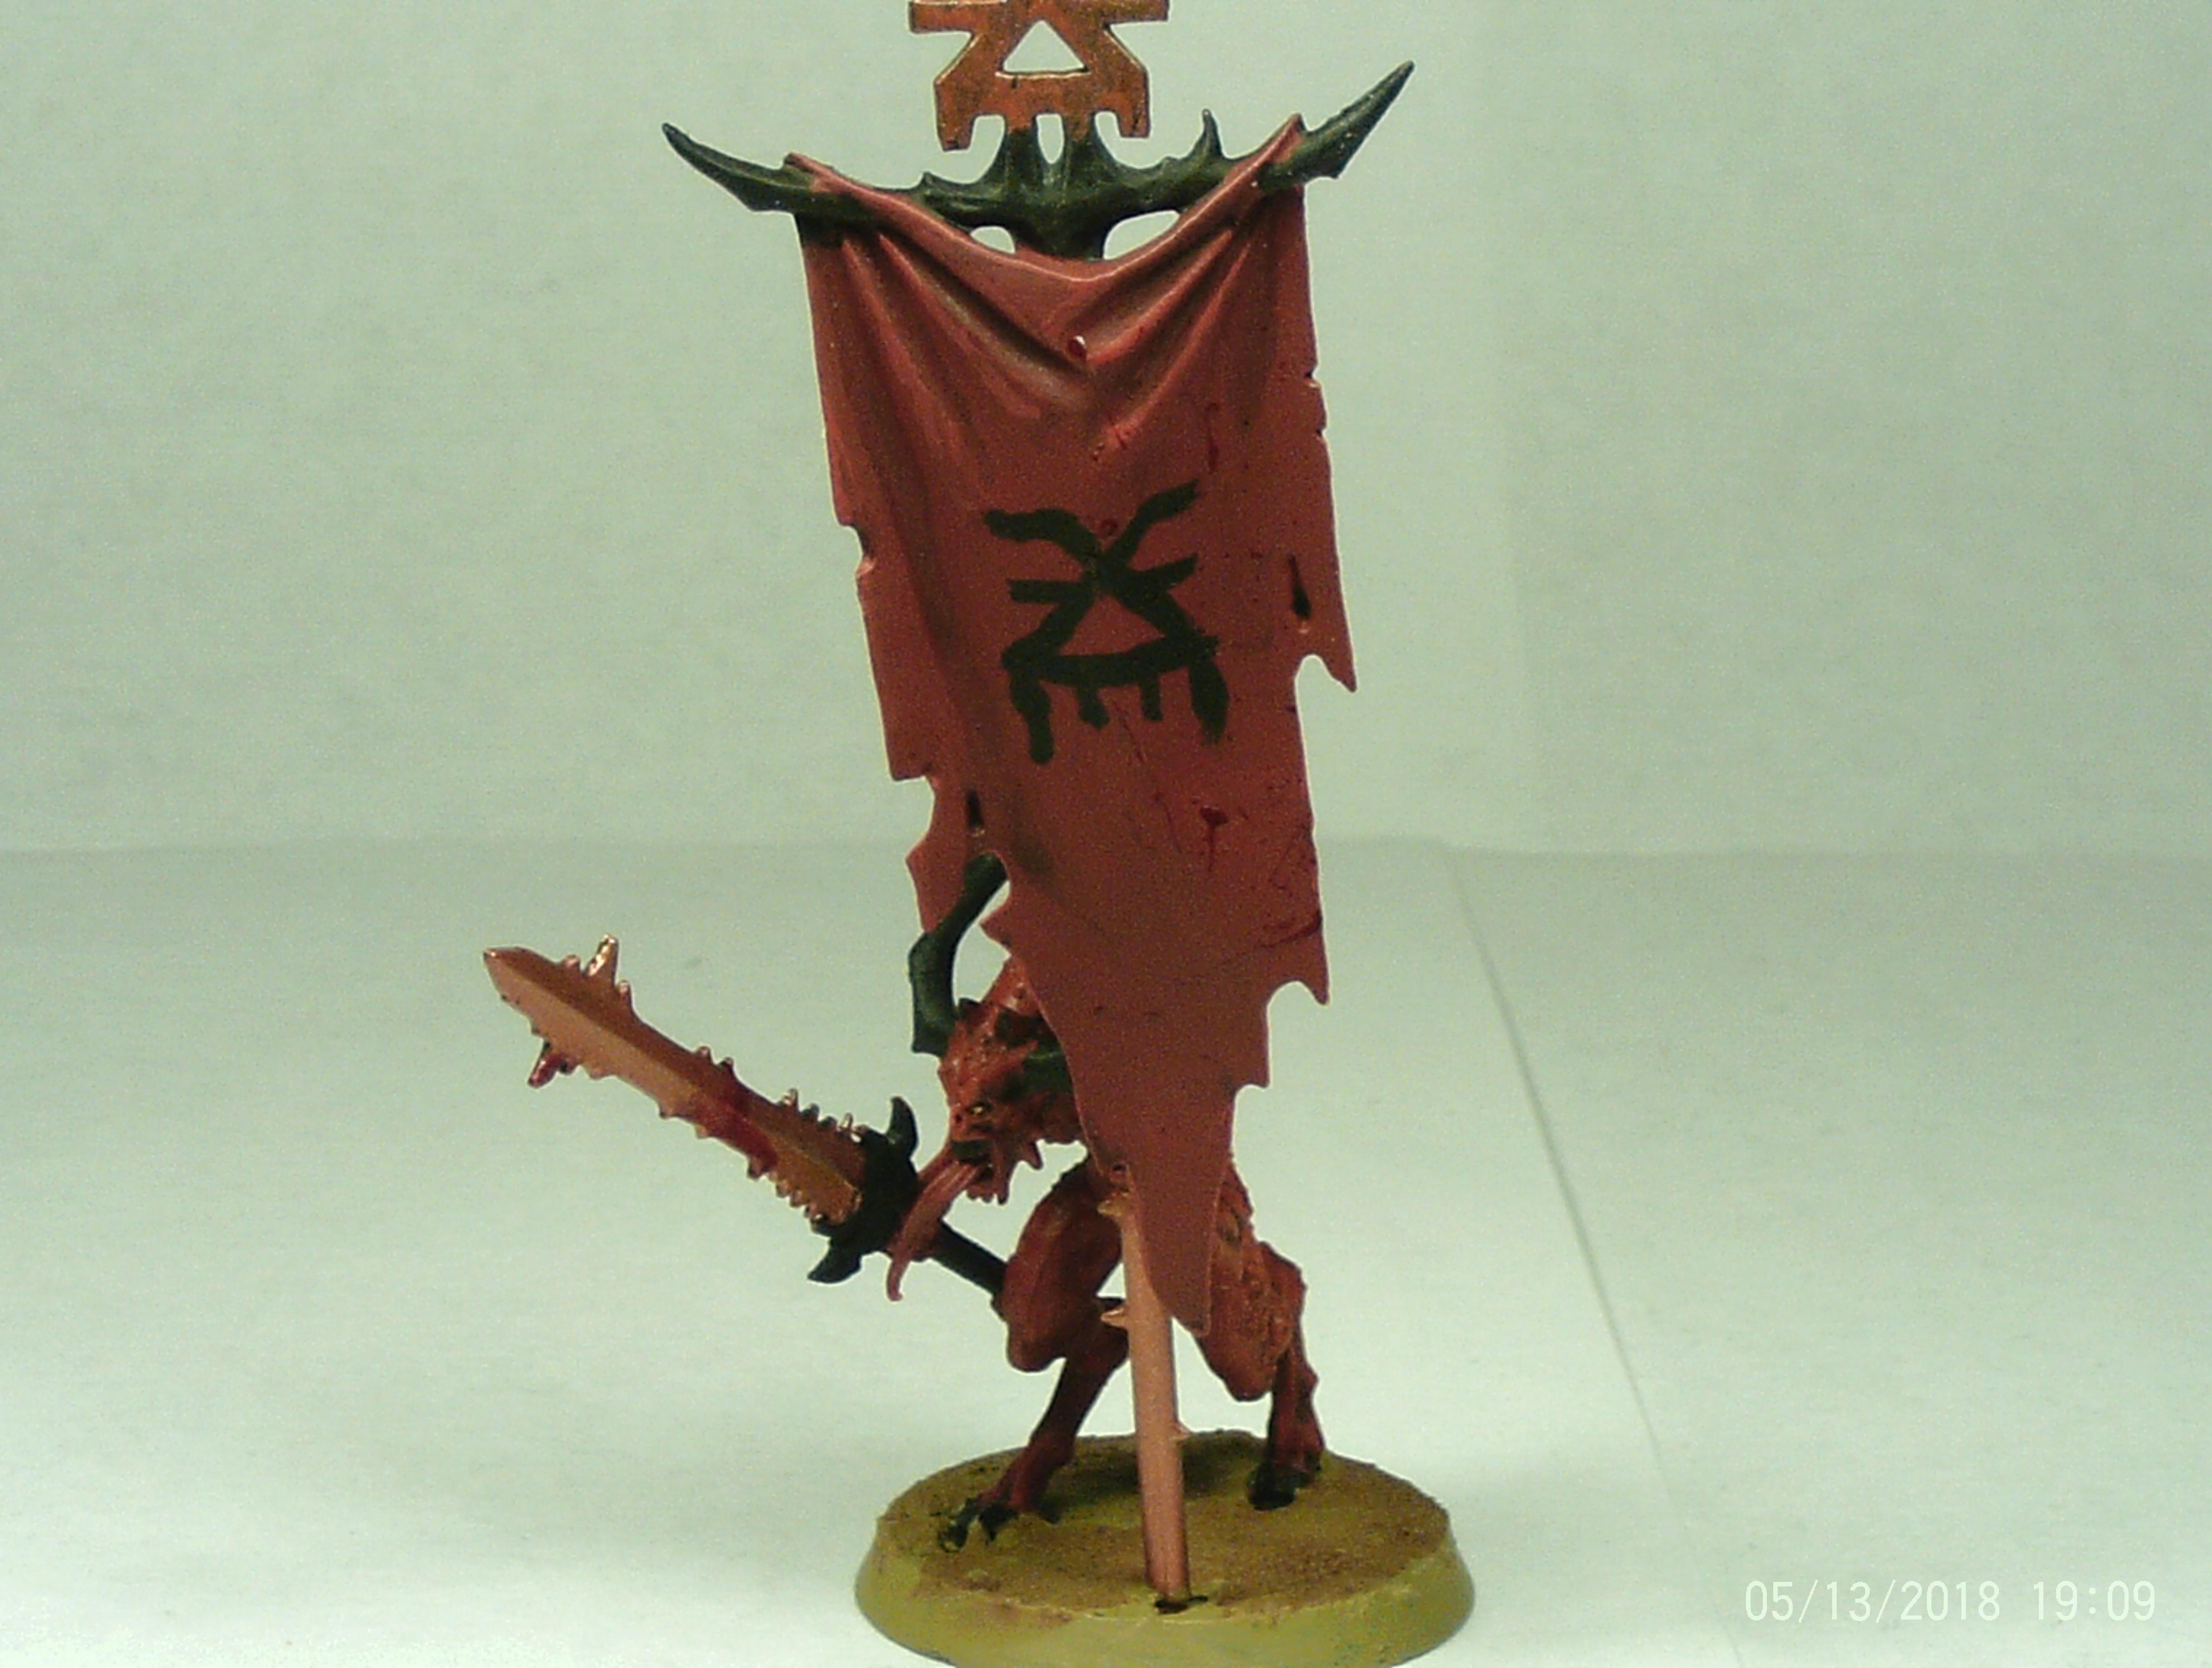 Blood, Bloodletters, Bronze, Daemons, God, Hellblade, Khorne, Lesser, Sword